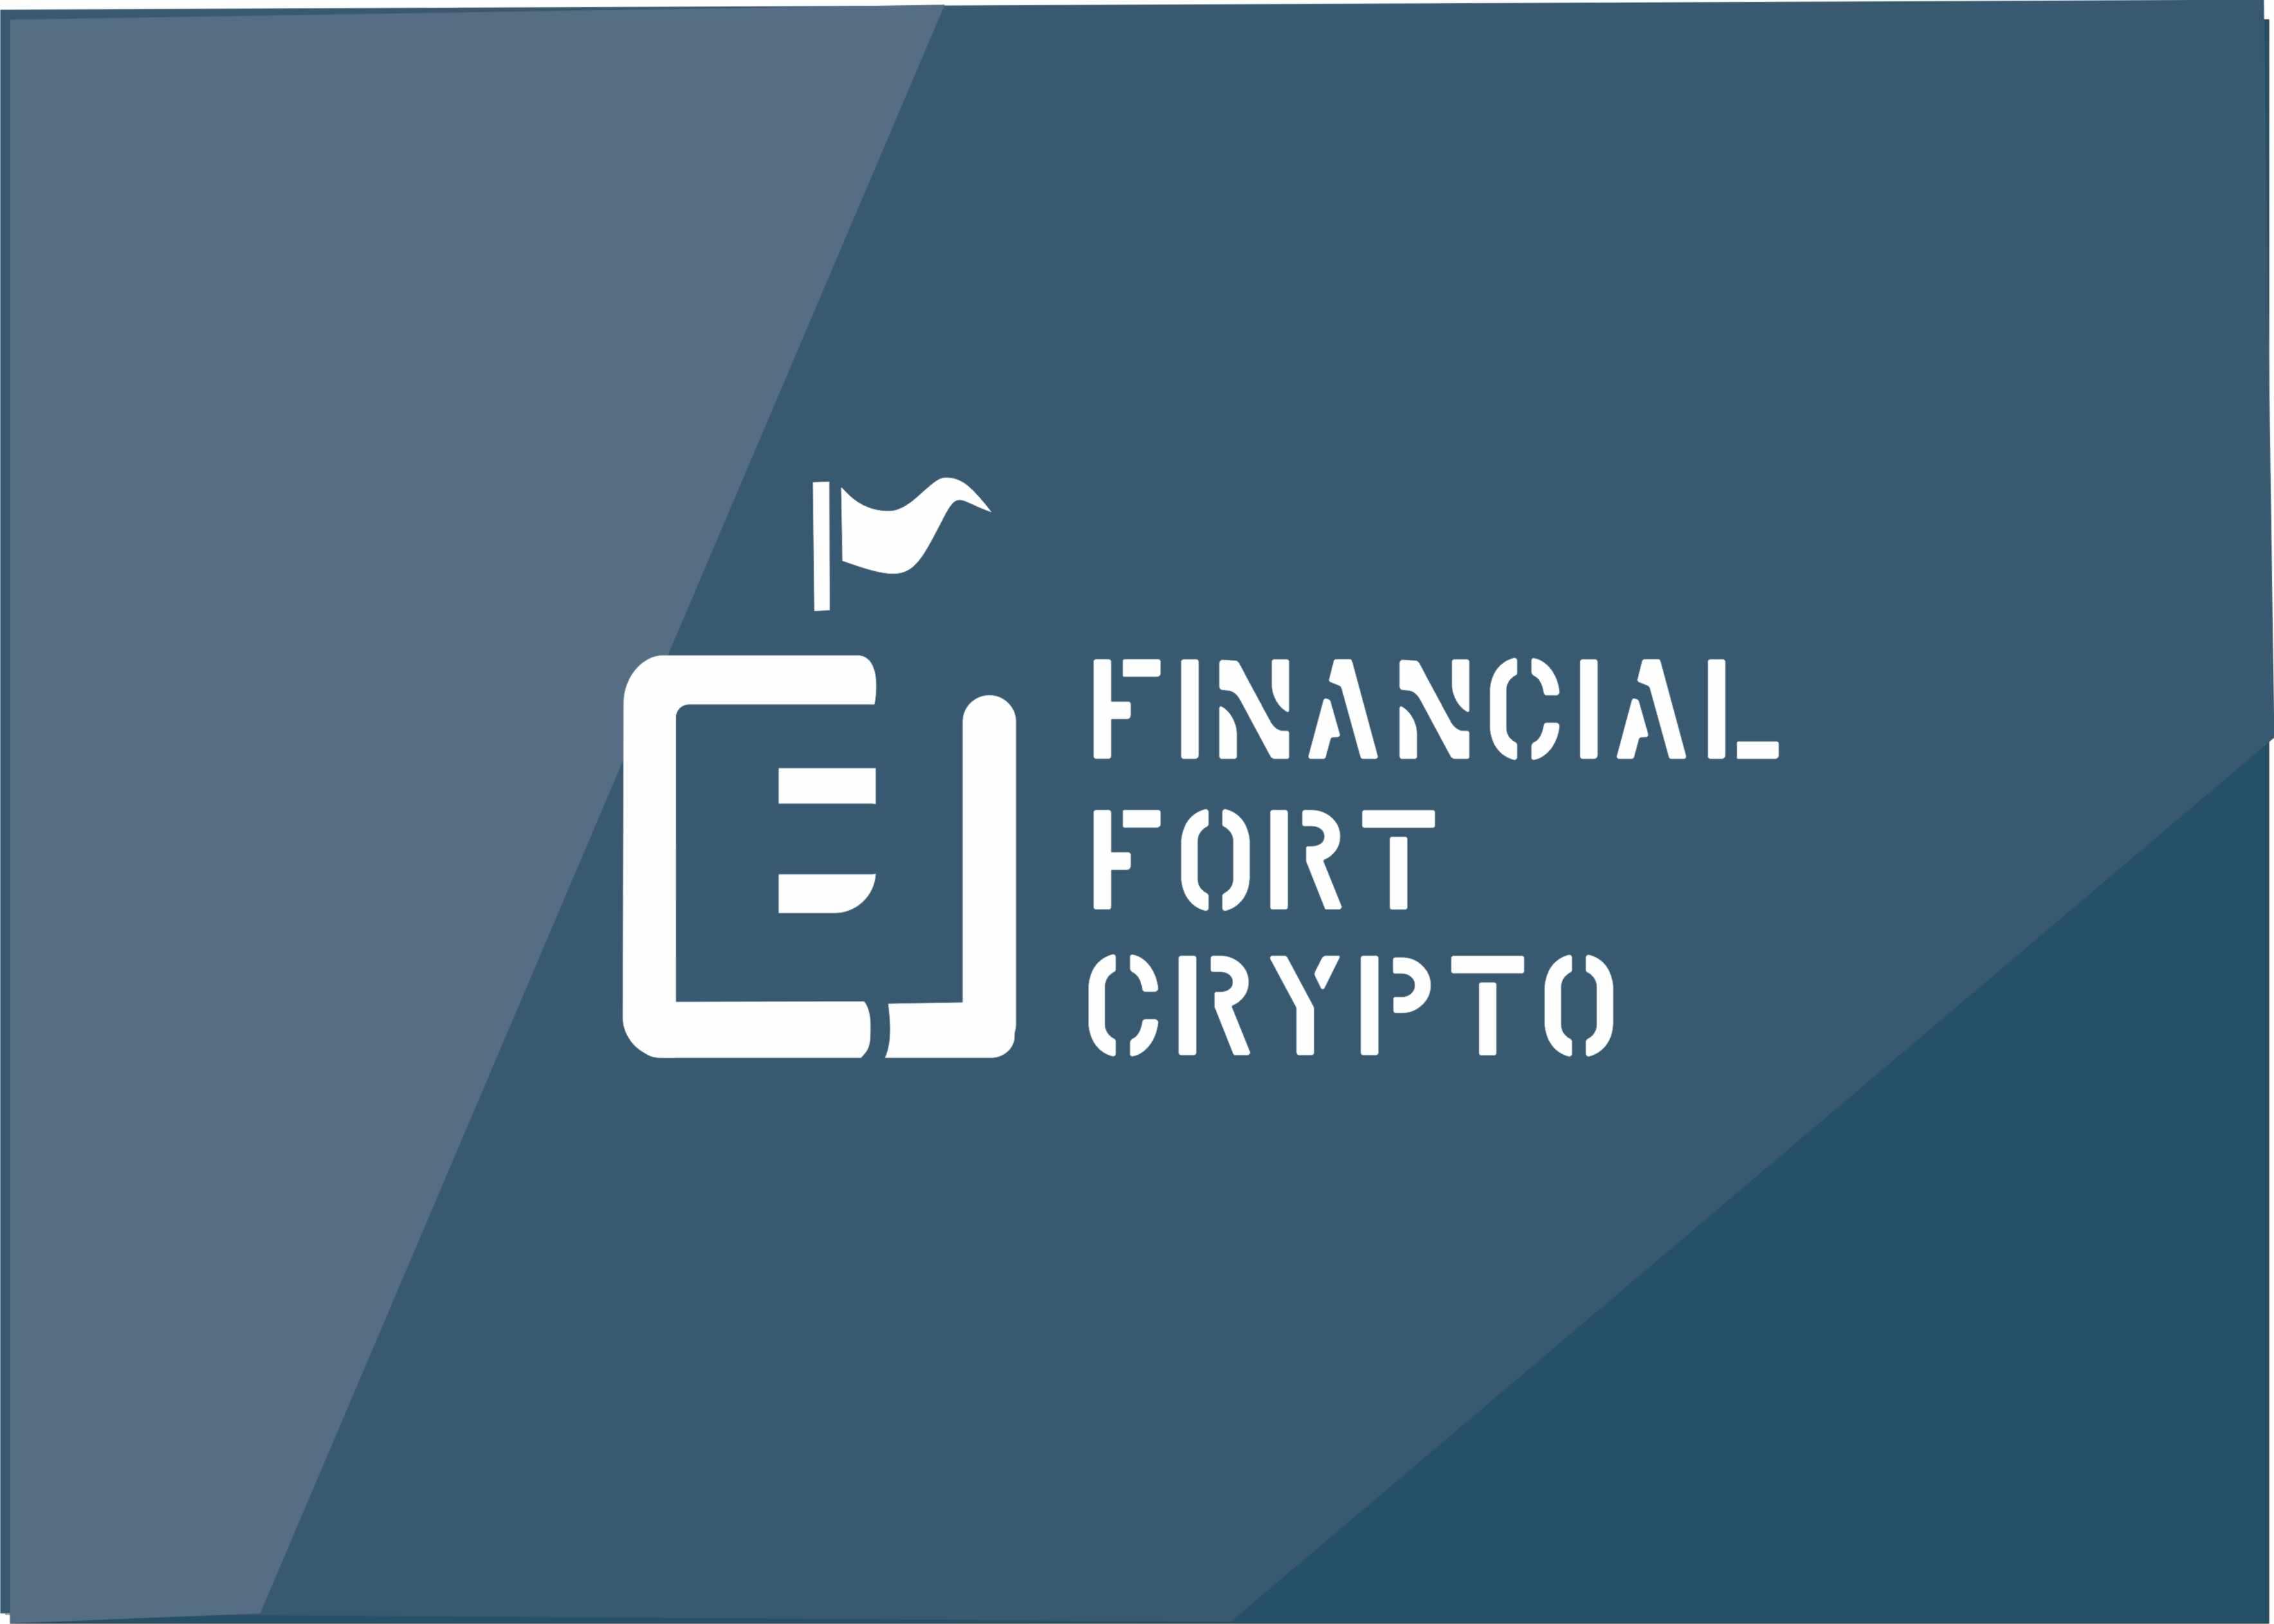 Разработка логотипа финансовой компании фото f_1515a8f0624562a6.jpg